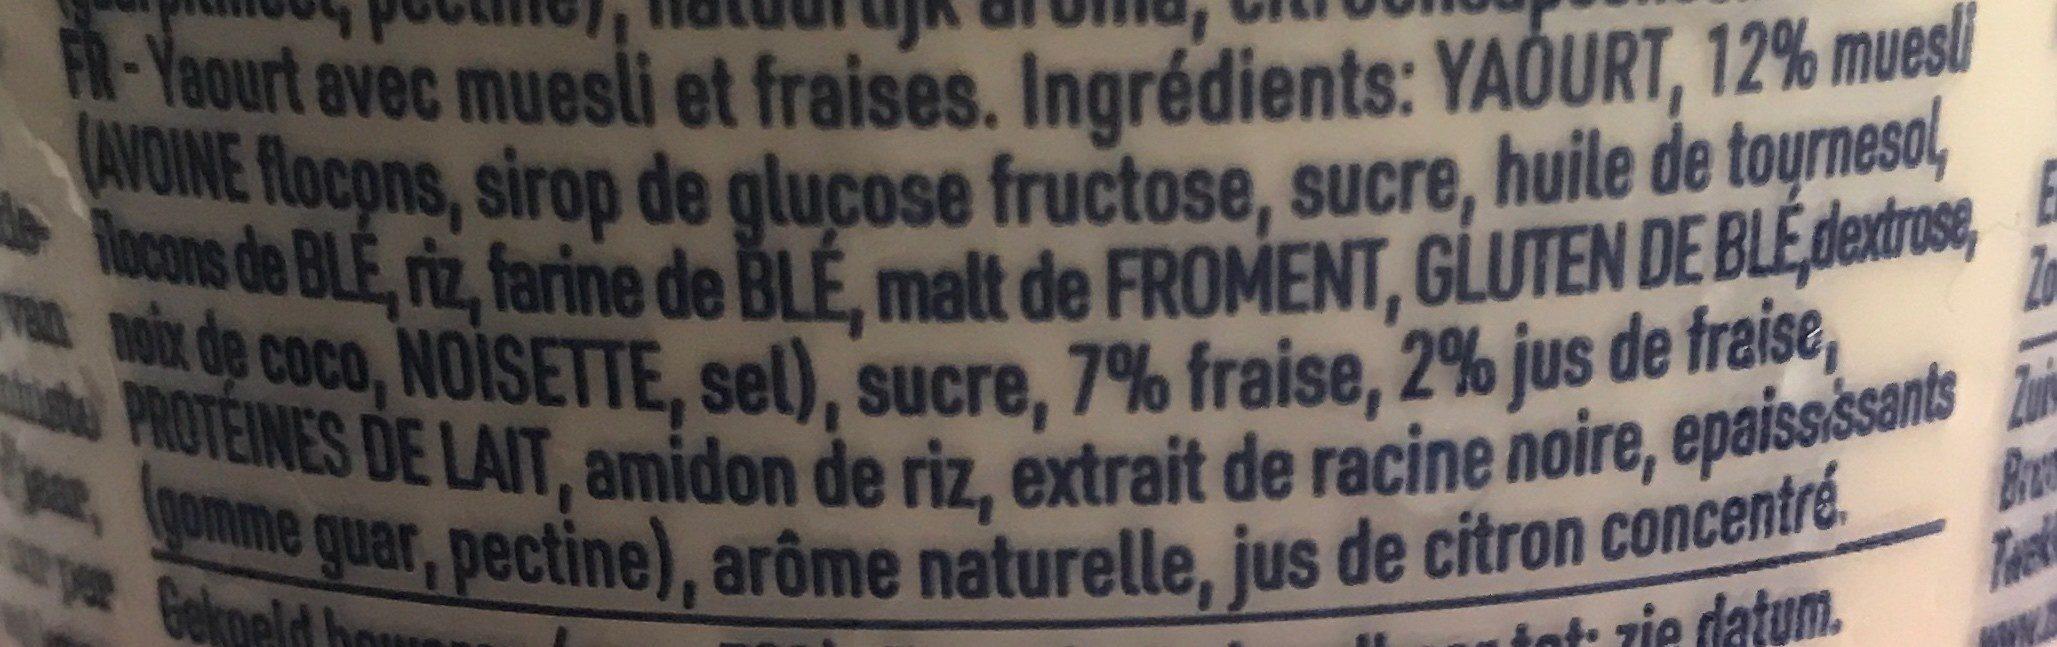 Muesli Fresa Yogurt - Ingredients - fr